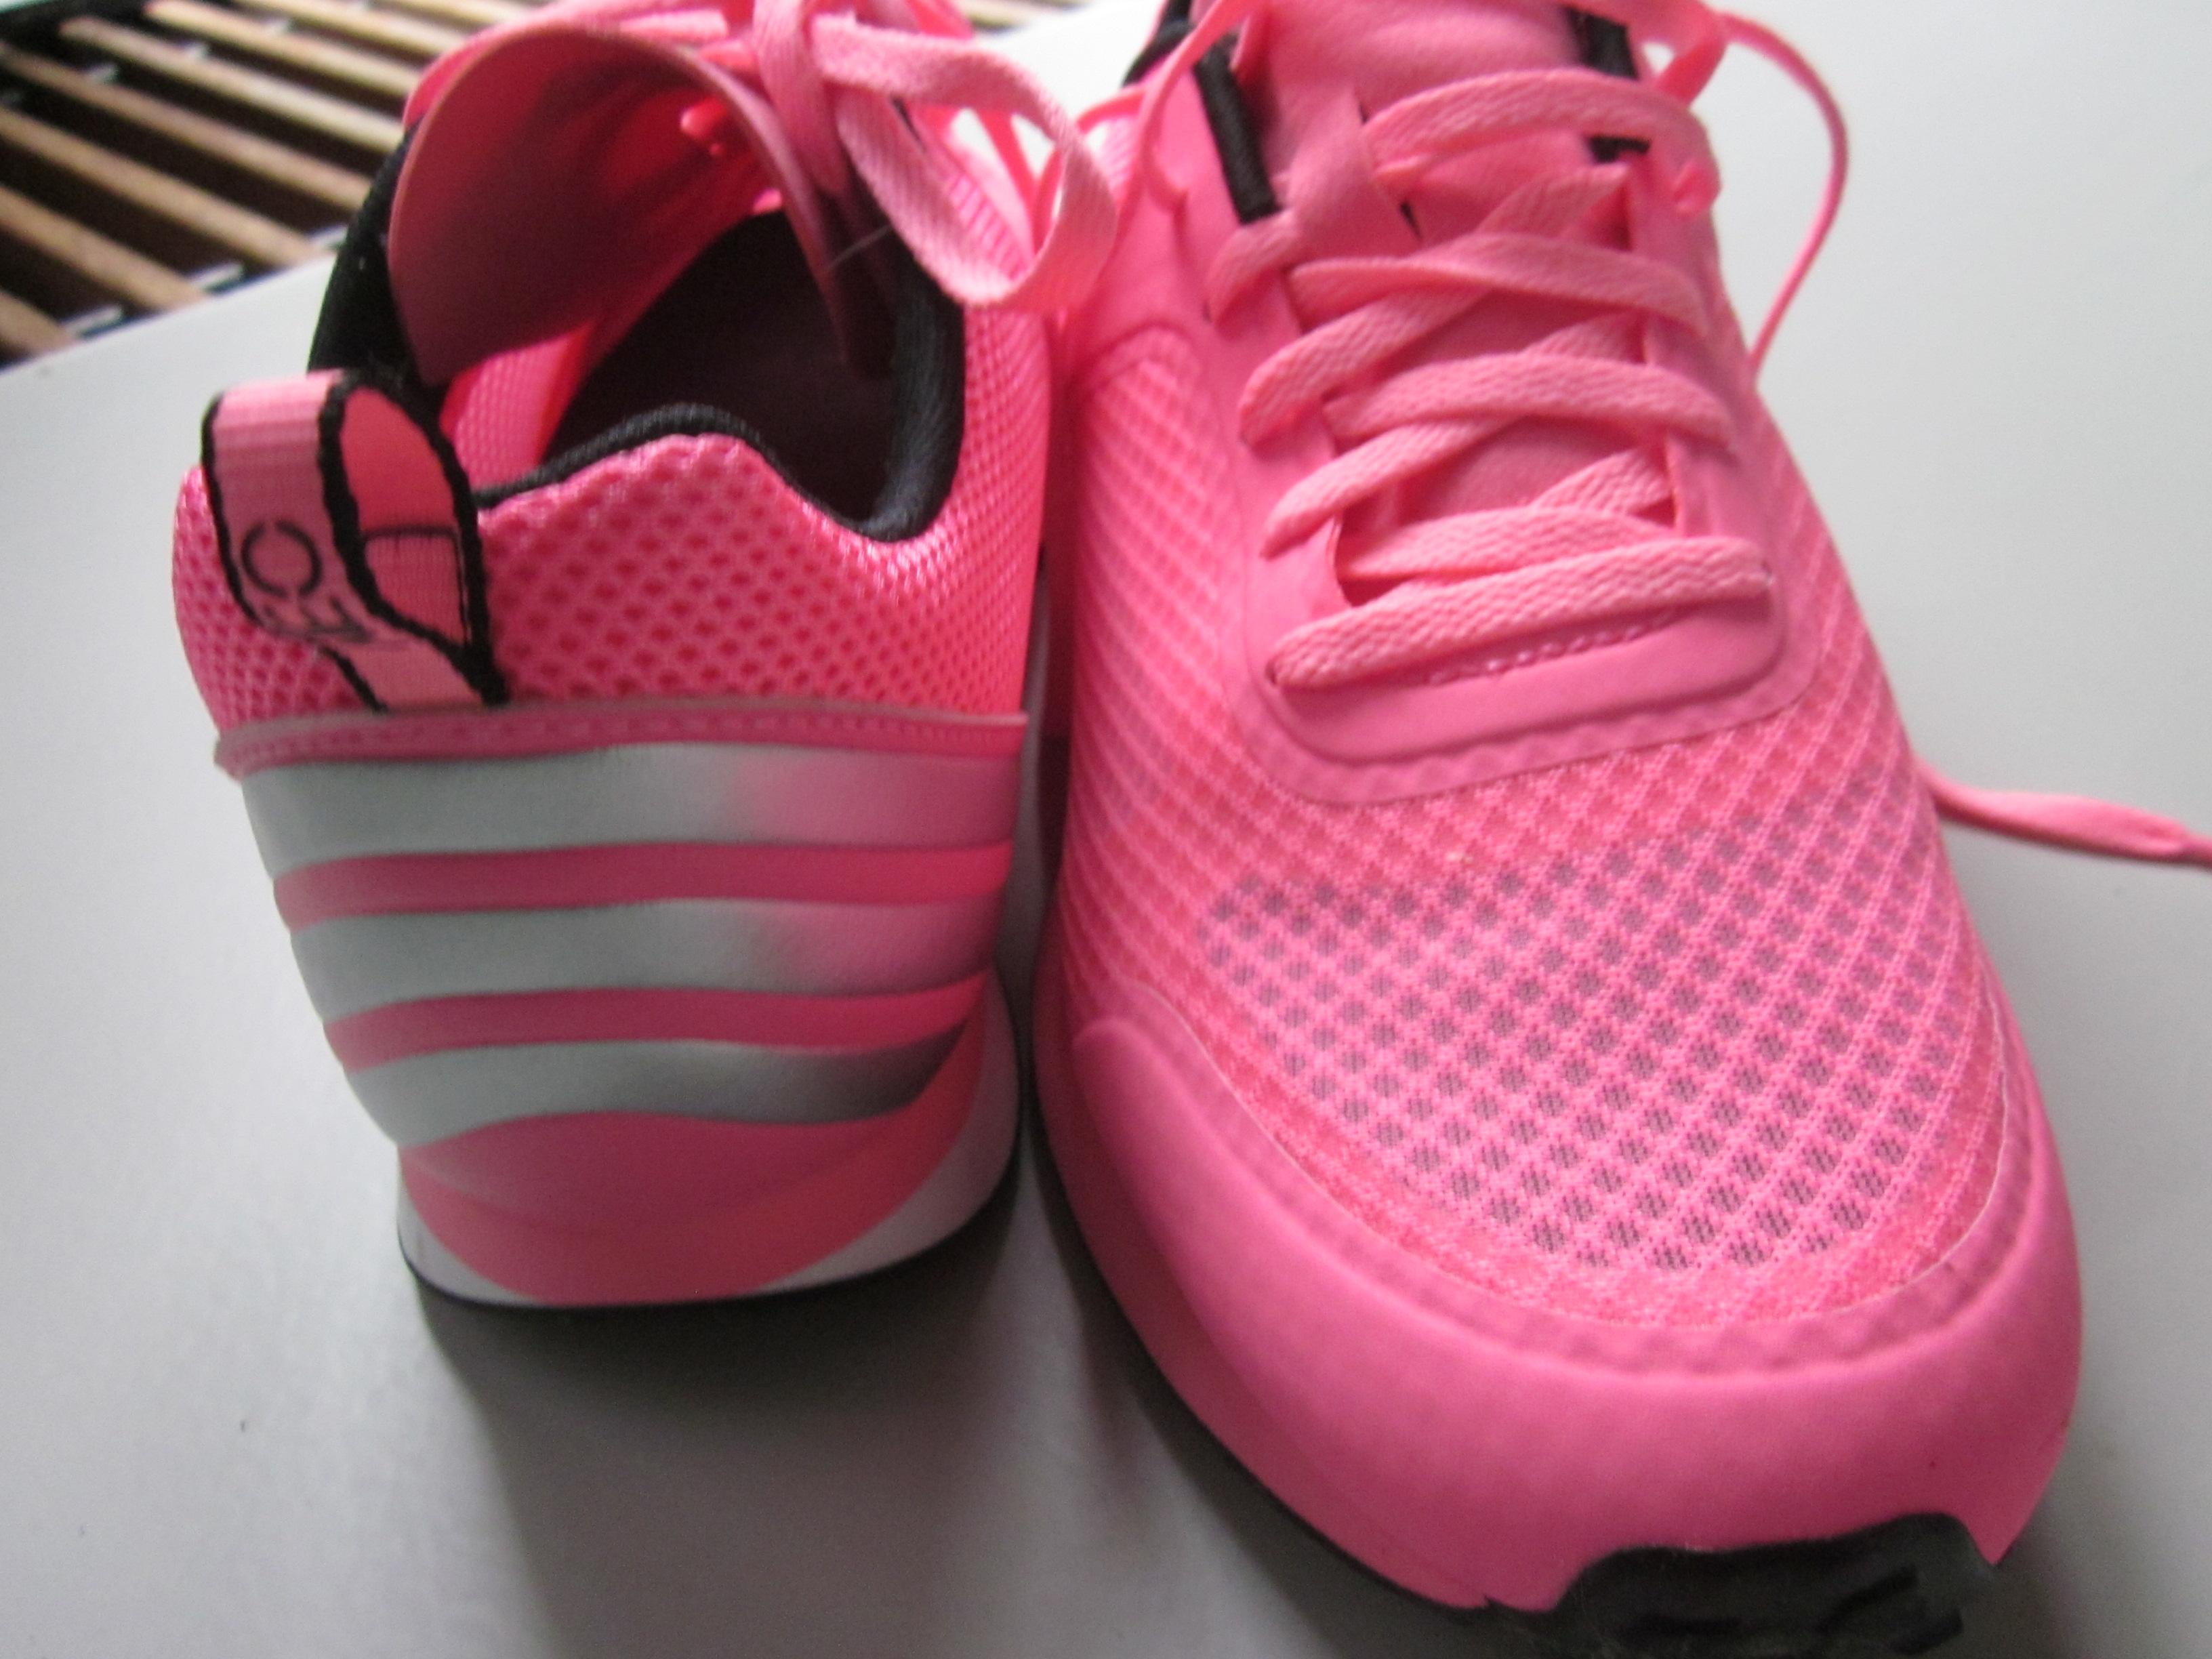 adidas schoenen felle kleuren